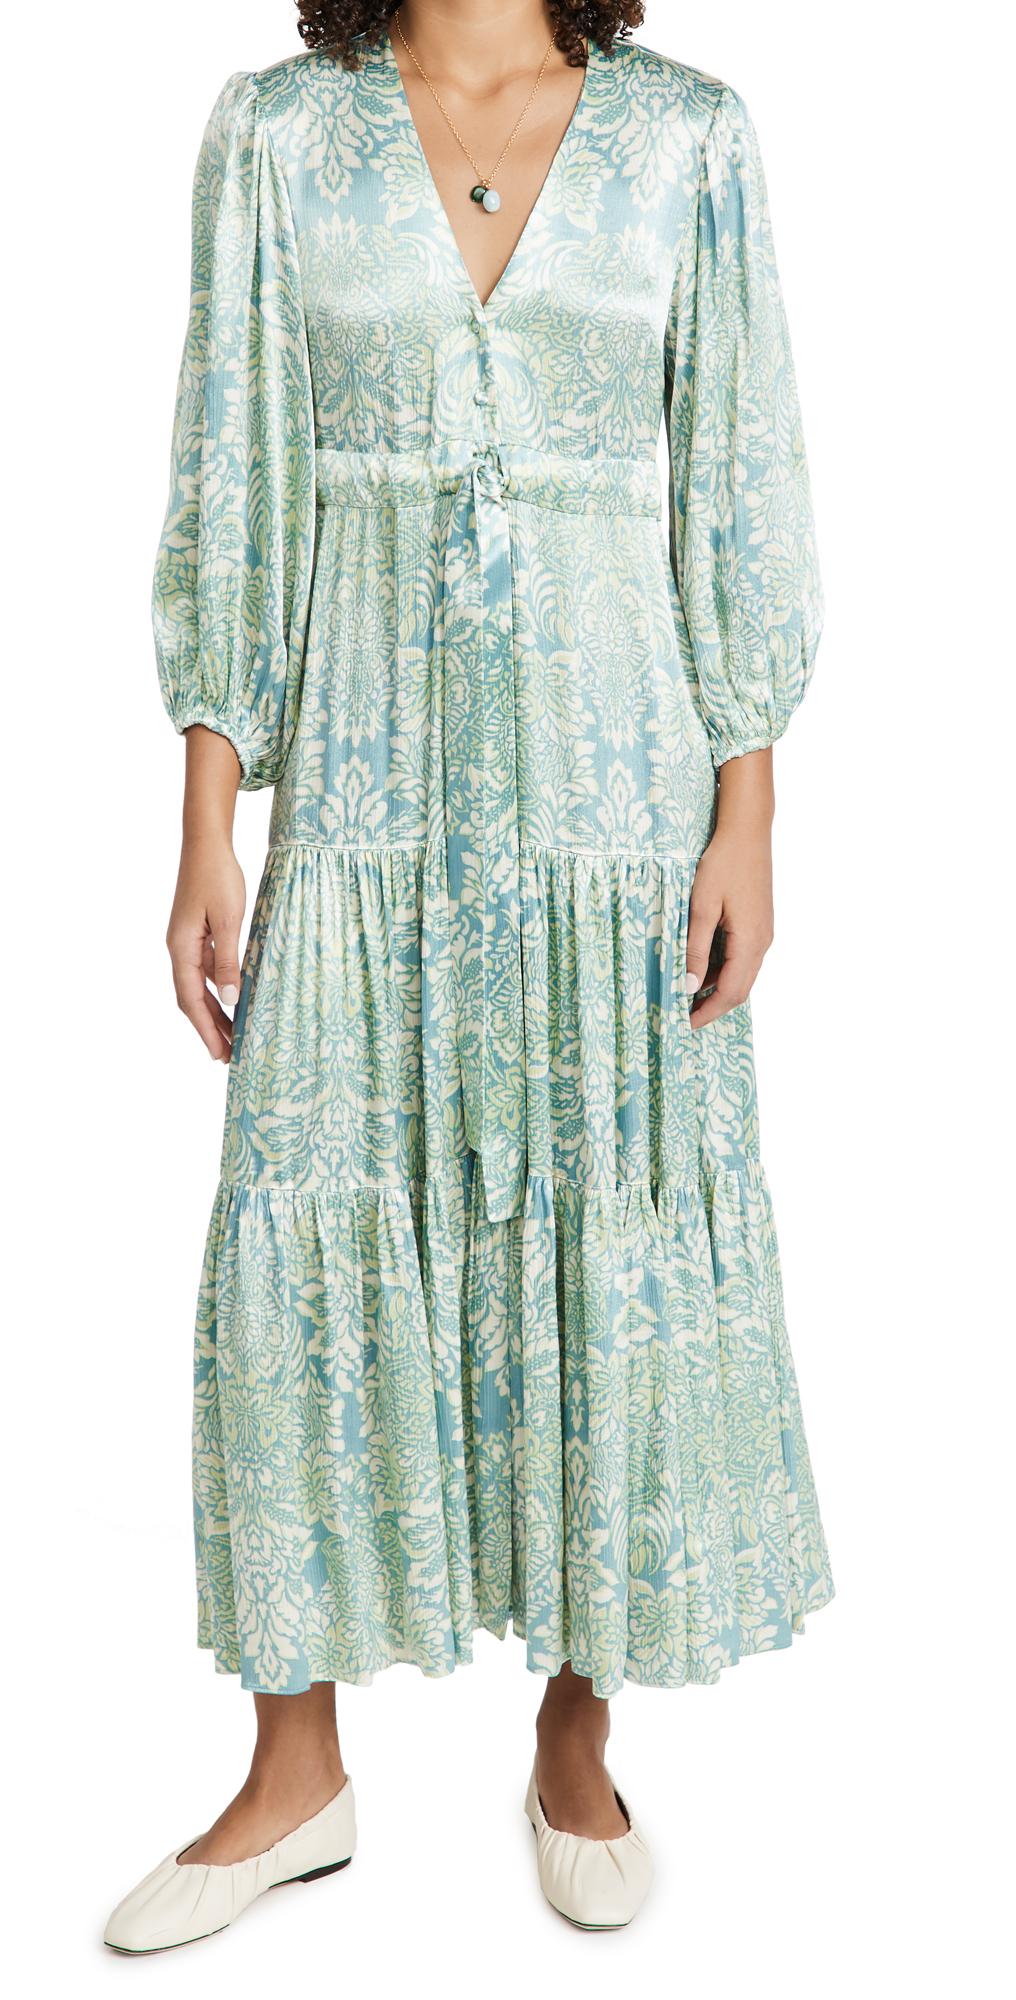 Alexis Fortunia Long Dress